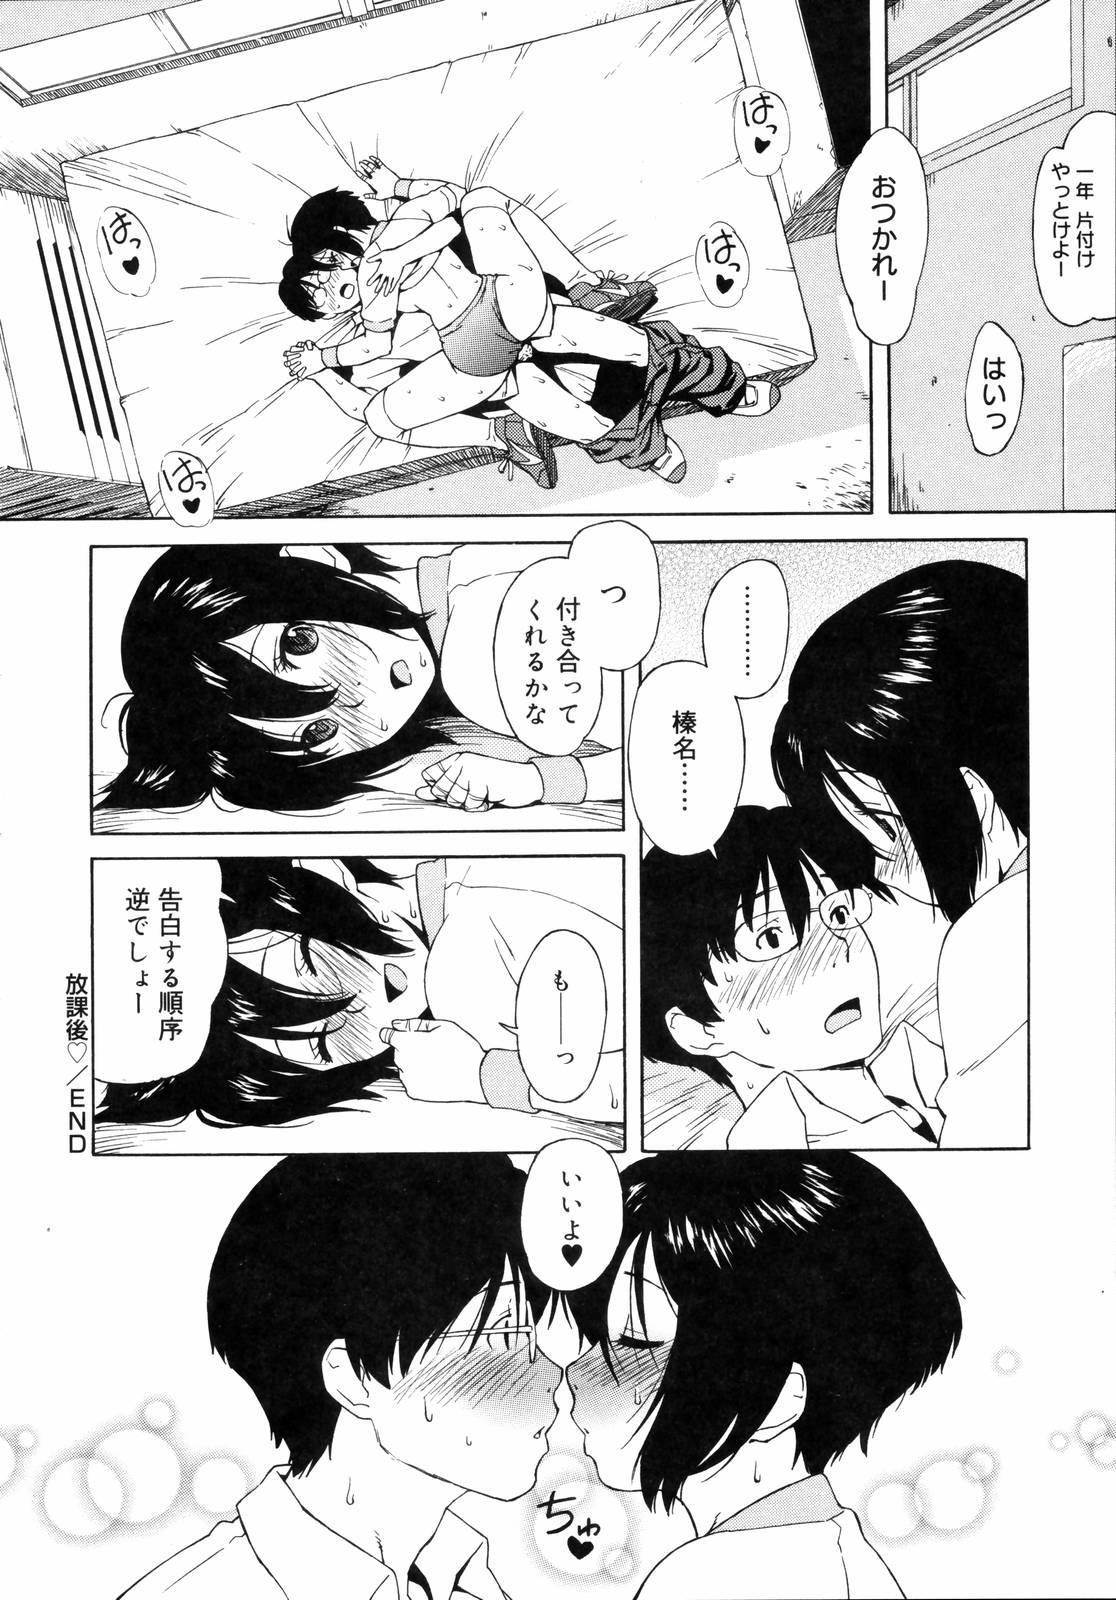 Shishunki wa Hatsujouki - Adolescence is a sexual excitement period. 25